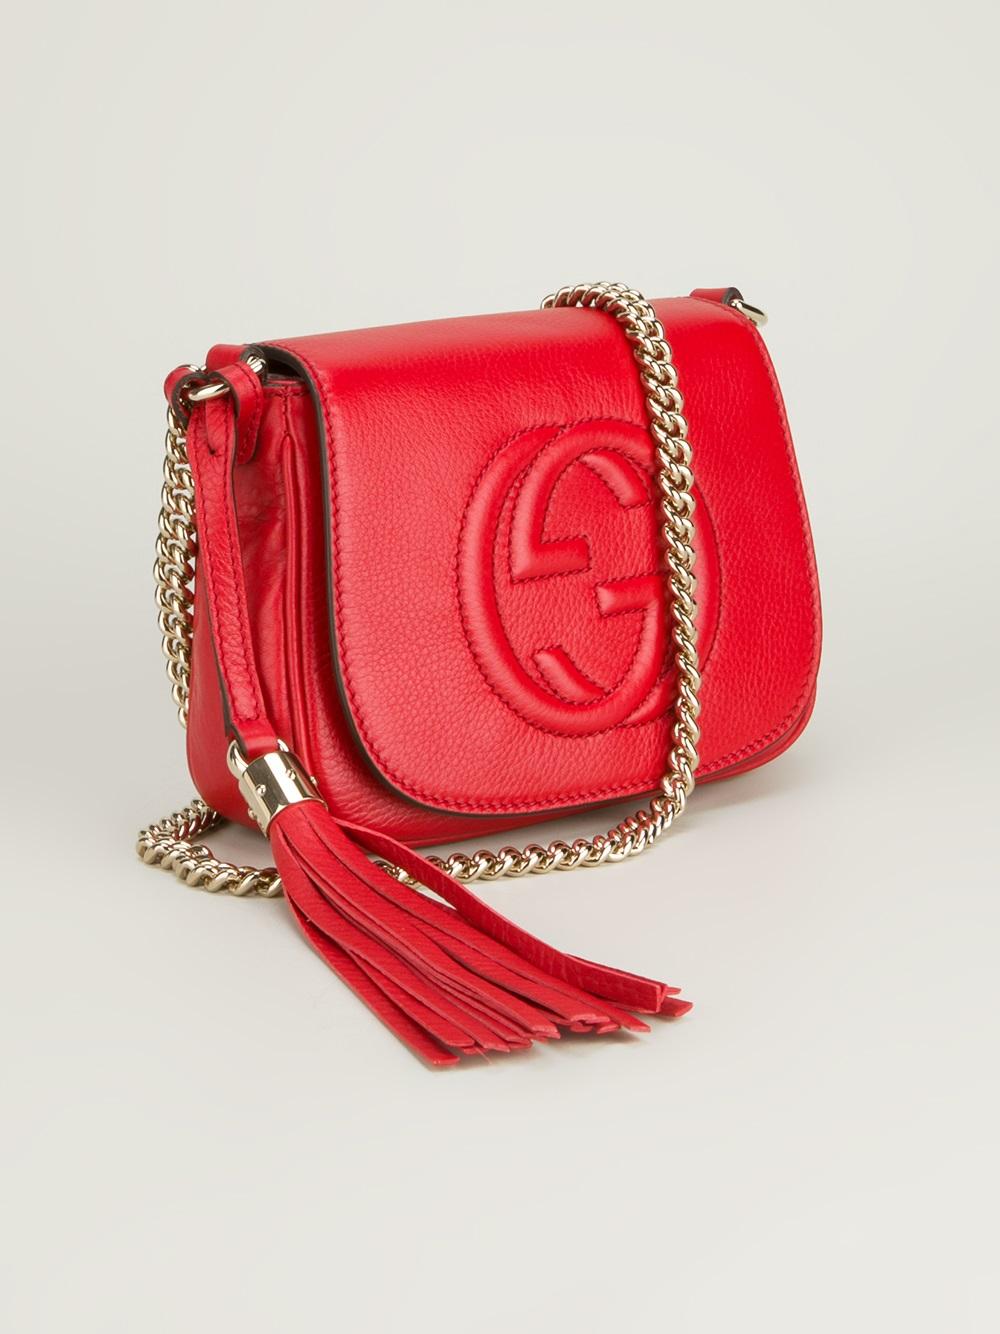 1c6e872a471f Gucci Women Soho Leather Shoulder Bag 282309a7m0g1000 - EpicGaming